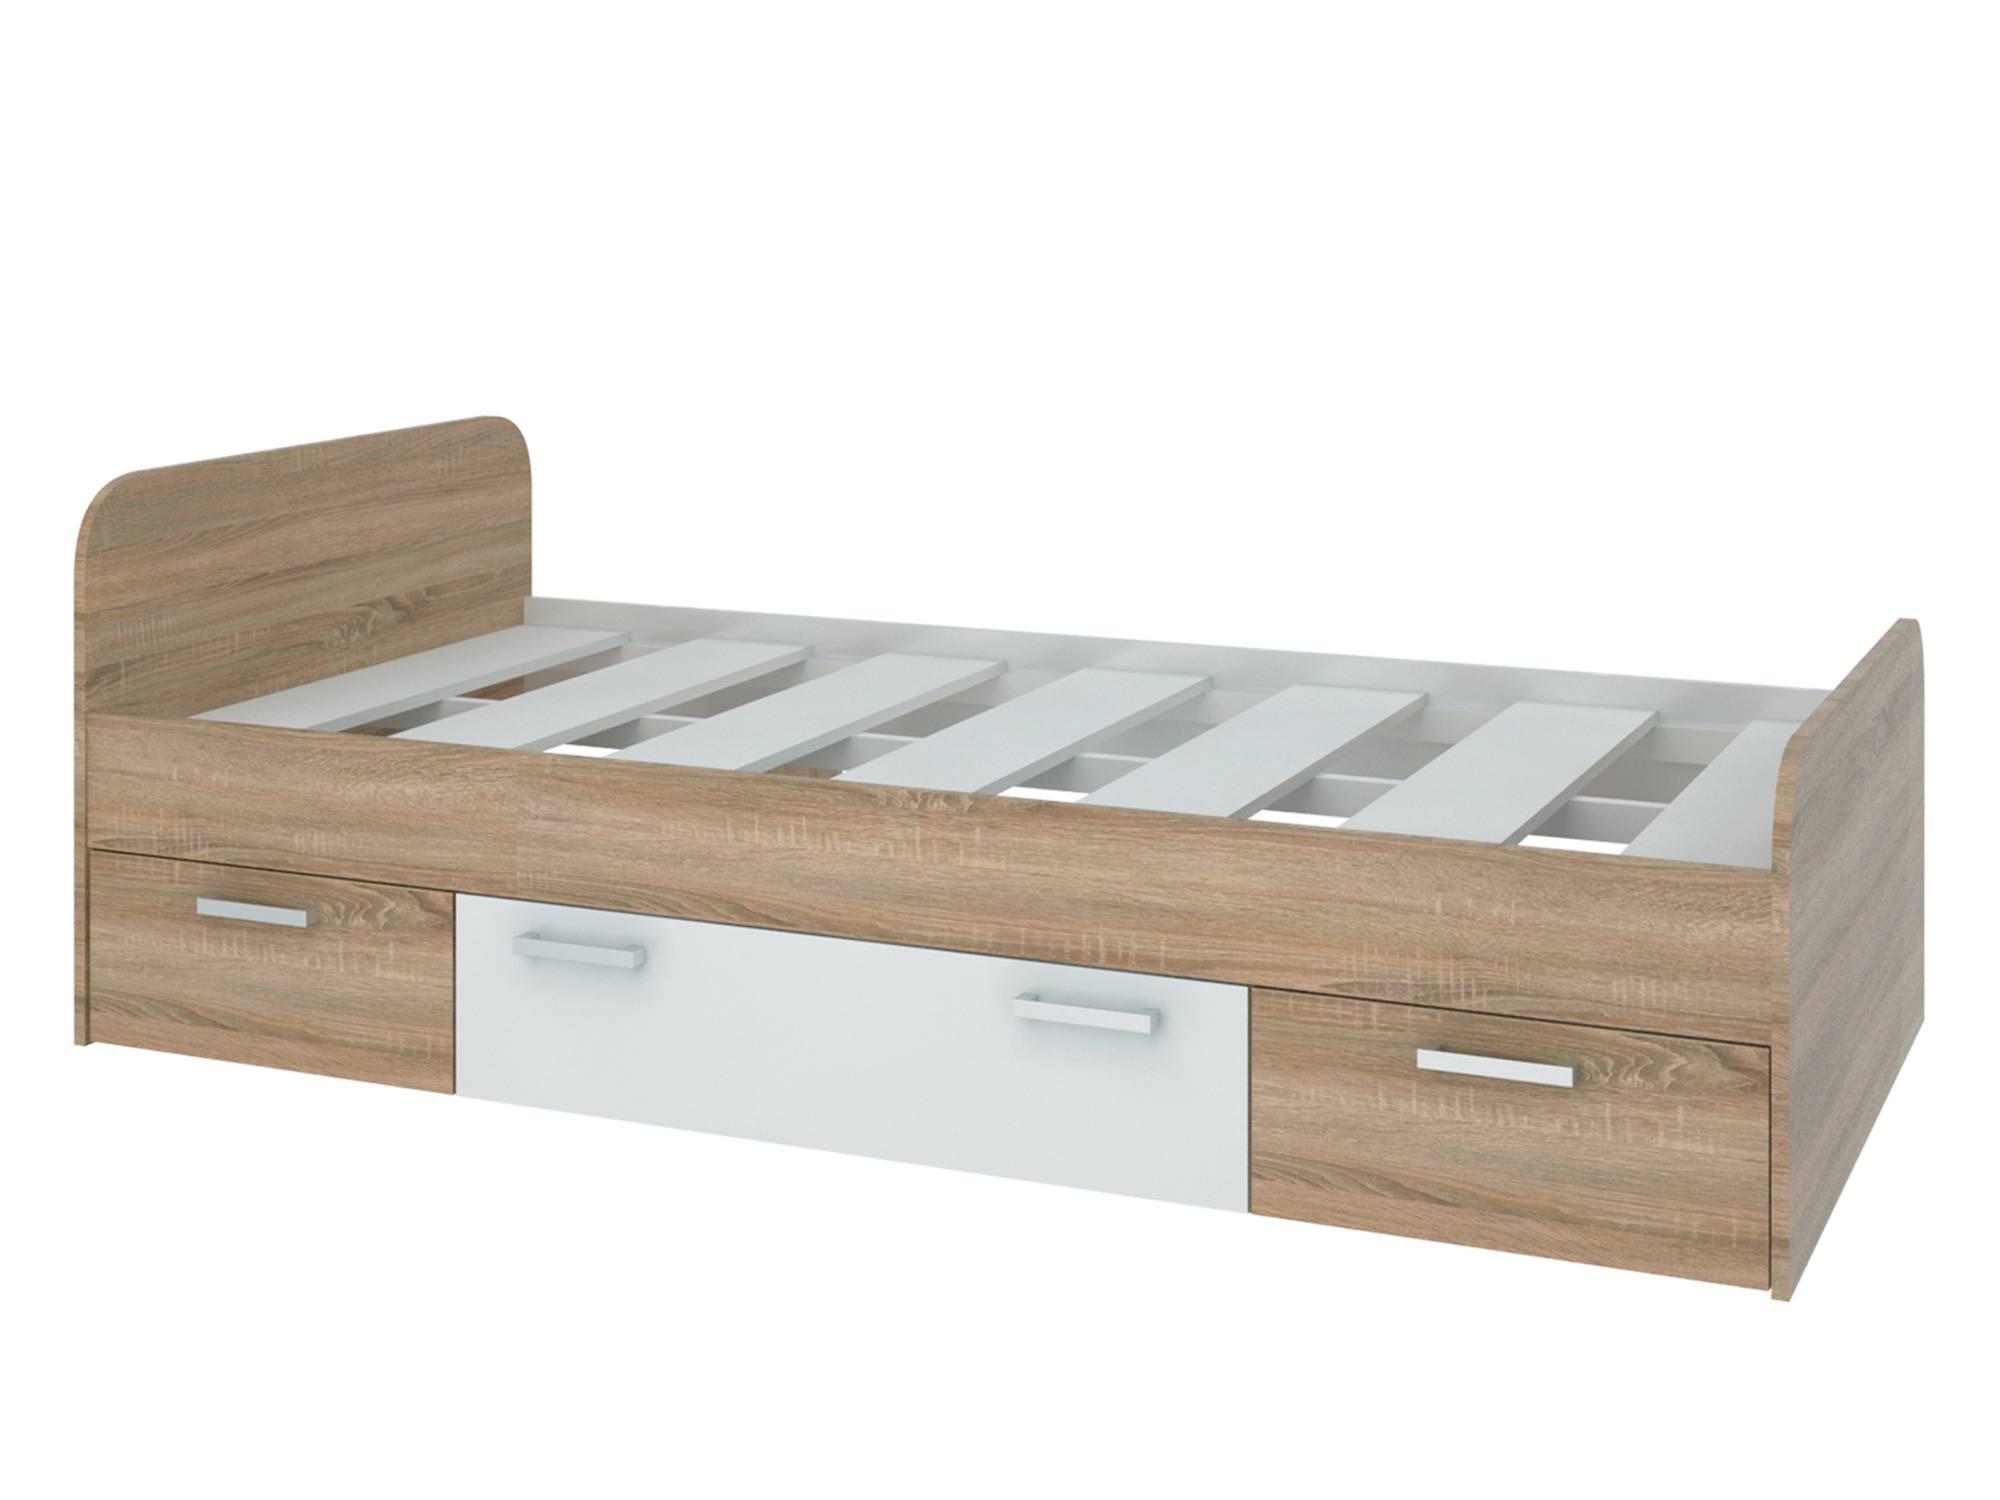 Кровать Мика (90х190) Дуб сонома, Белый, Бежевый, , ЛДСП, КДСП